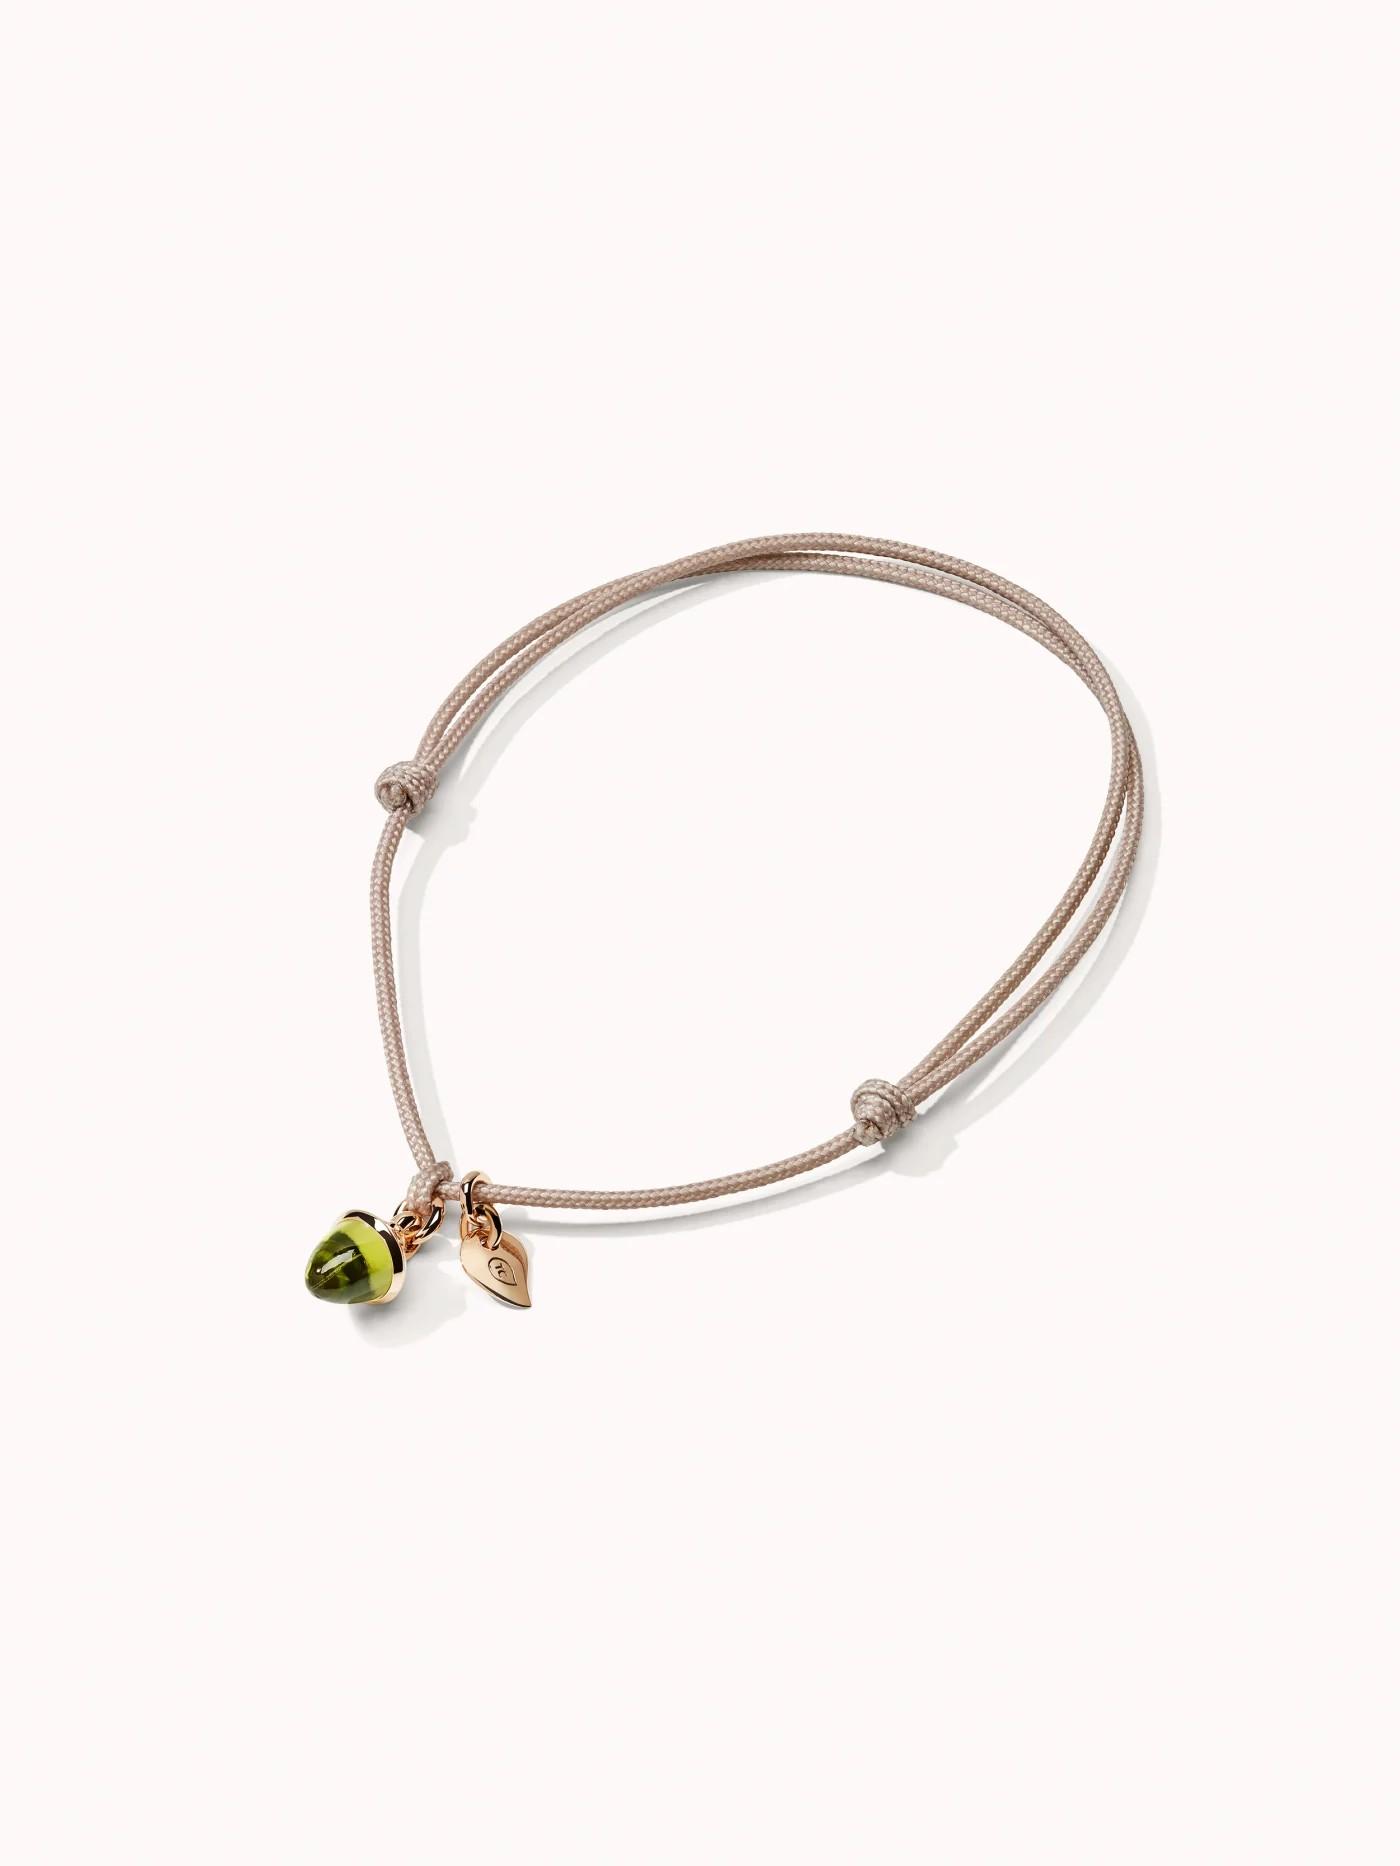 Armband My Mikado Peridot - Tamara Comolli - B-MM-Per-rg